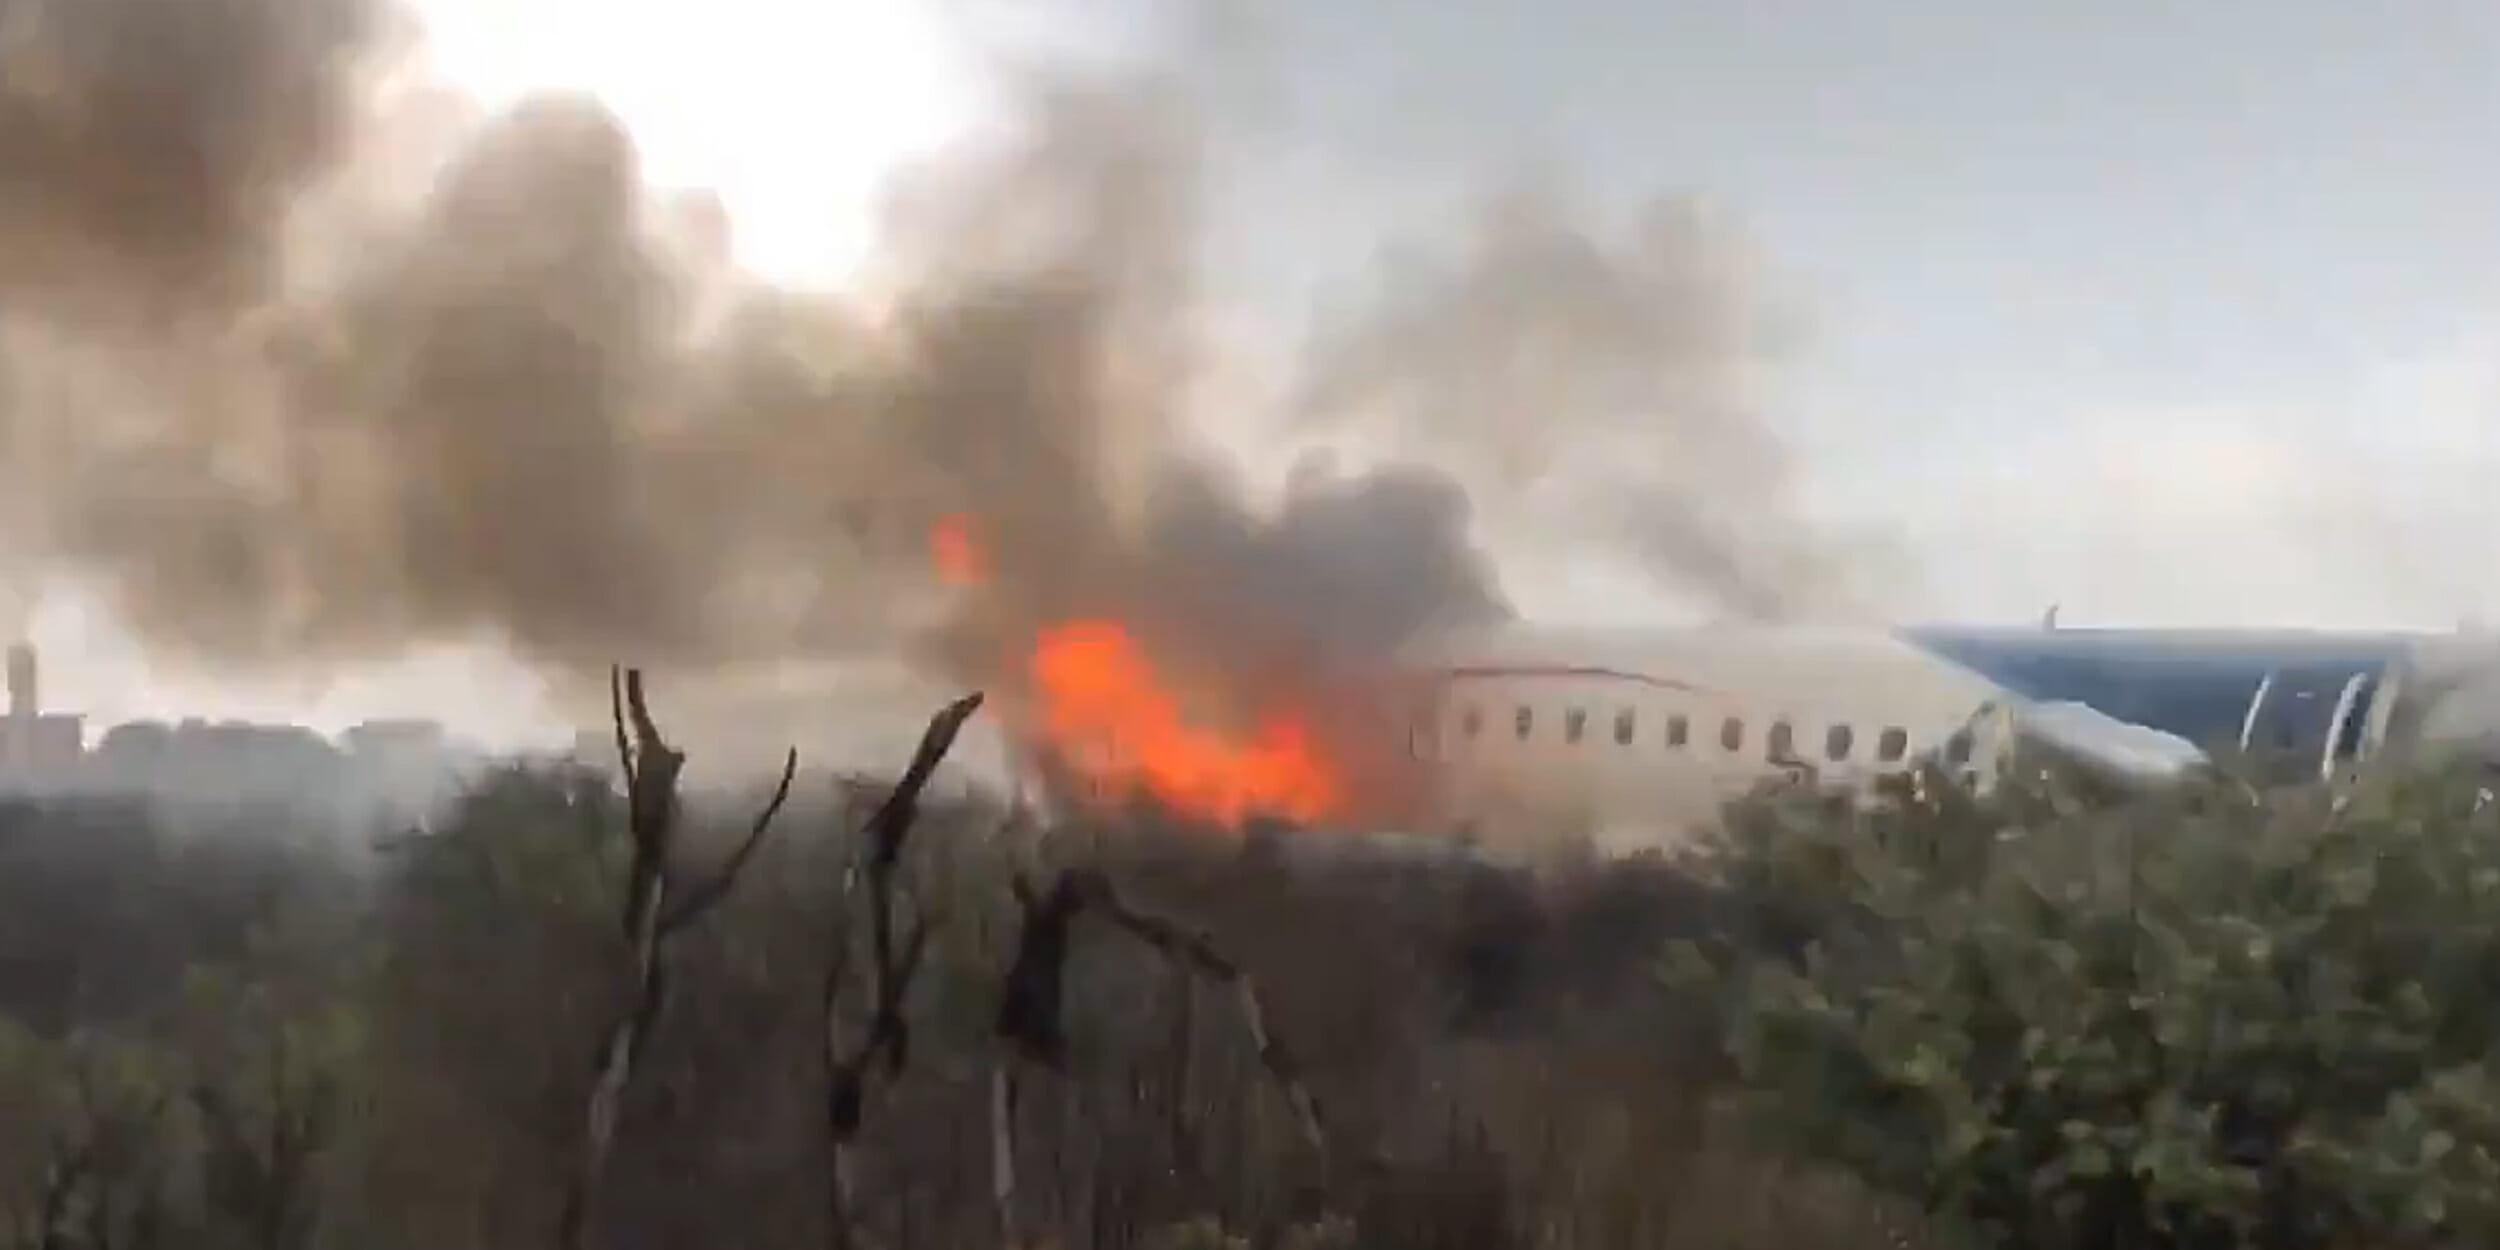 aeromexico plane crash